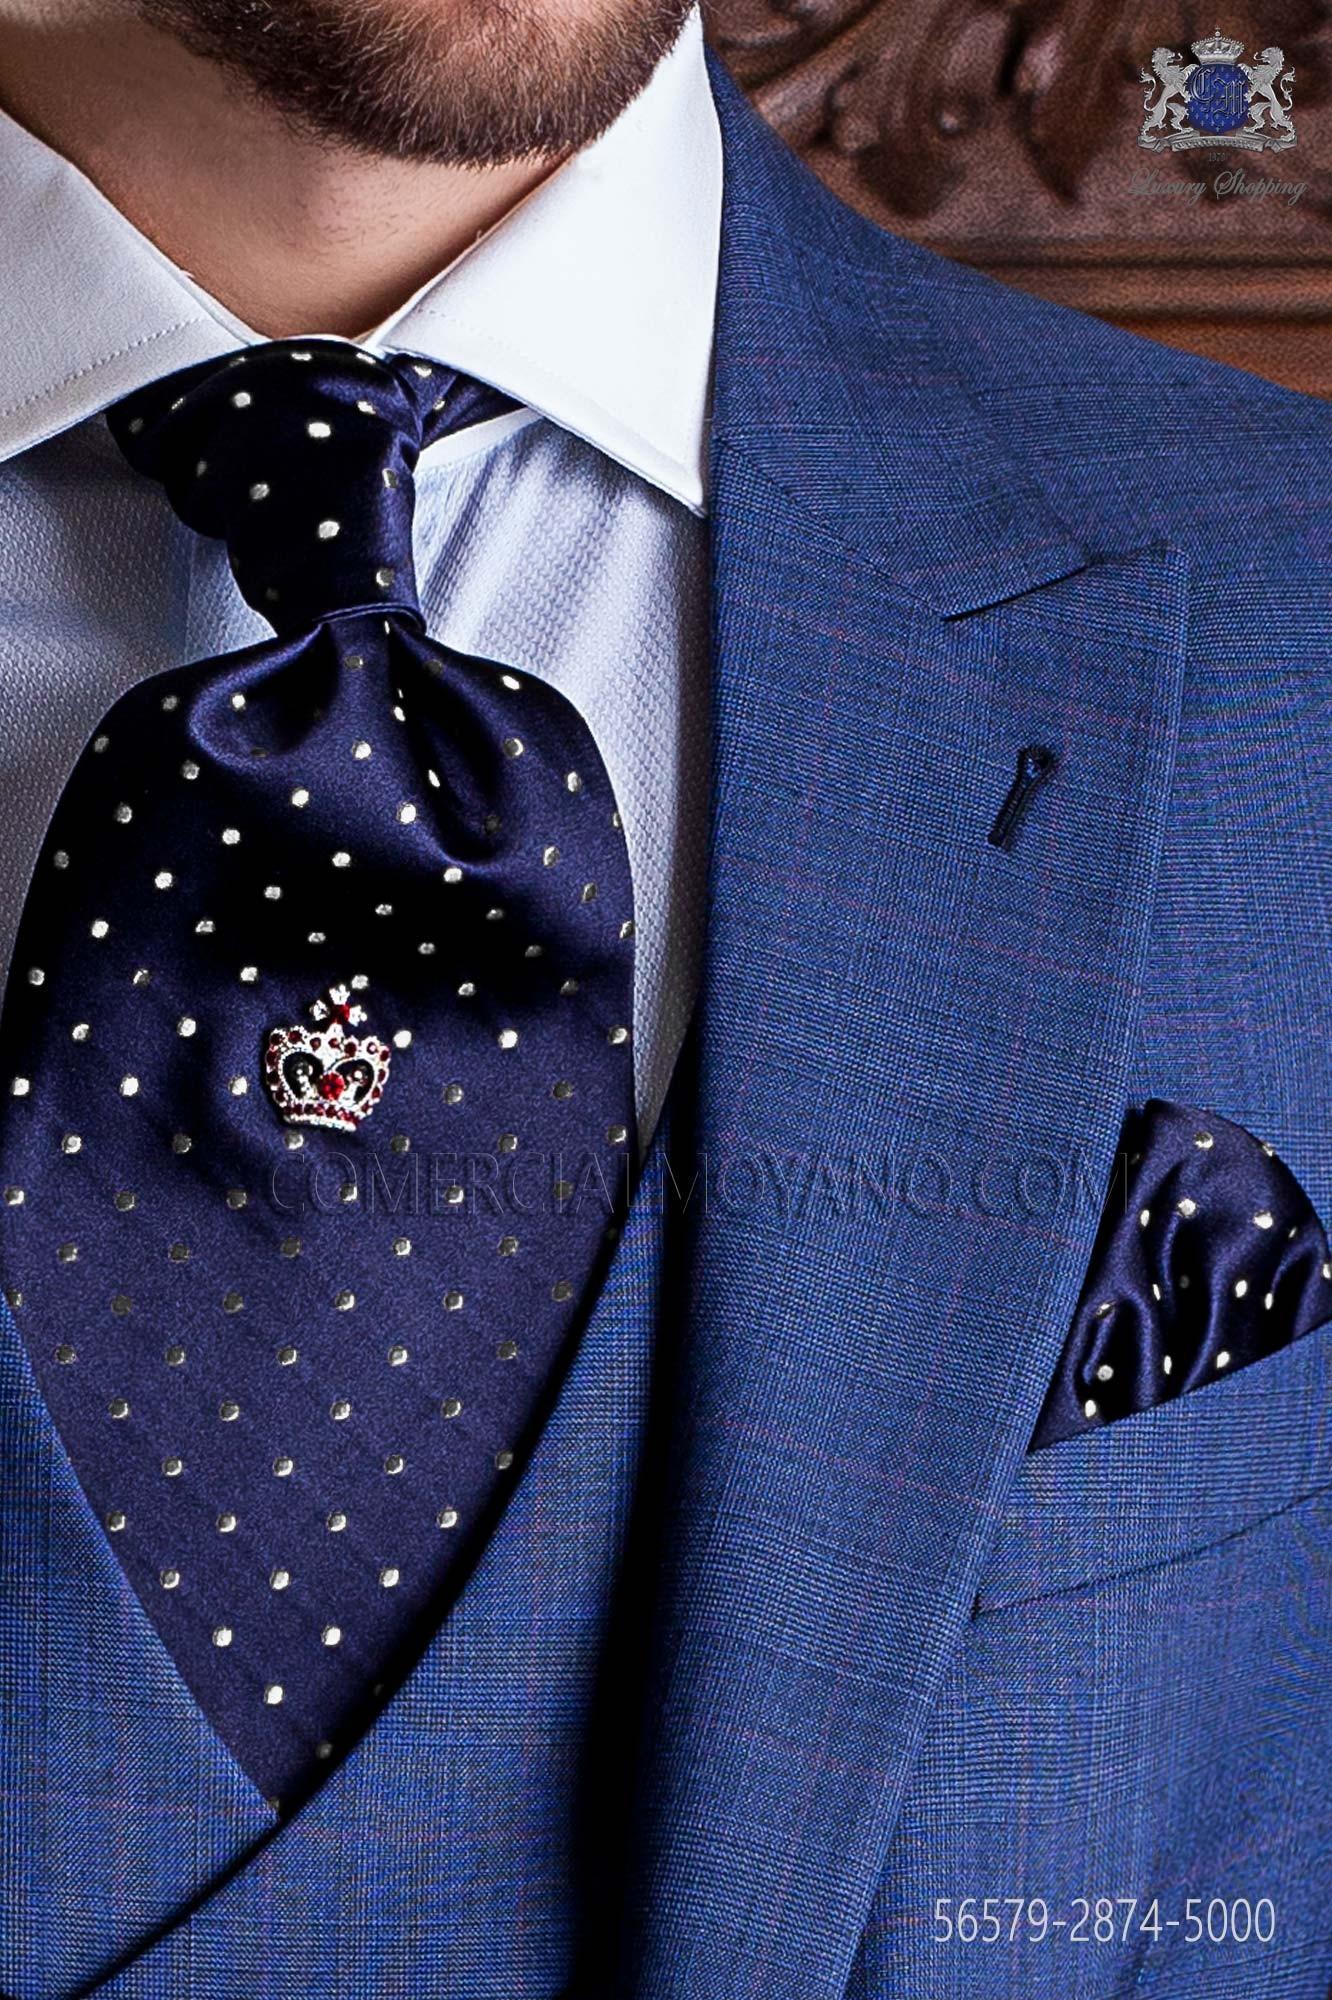 b298d6eba08b Navy blue Ascot tie and handkerchief with white polka dots. Loading zoom